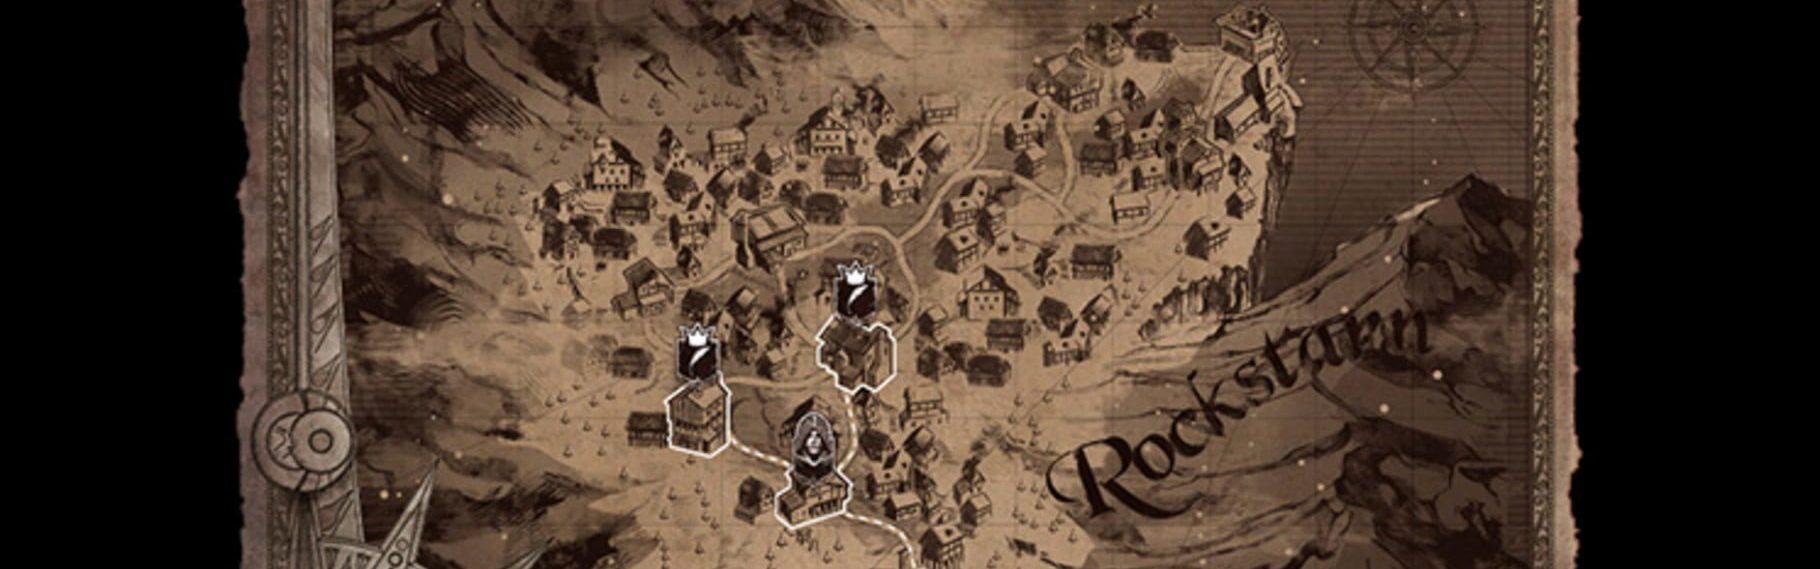 Joe Dever's Lone Wolf HD Remastered Steam Key GLOBAL